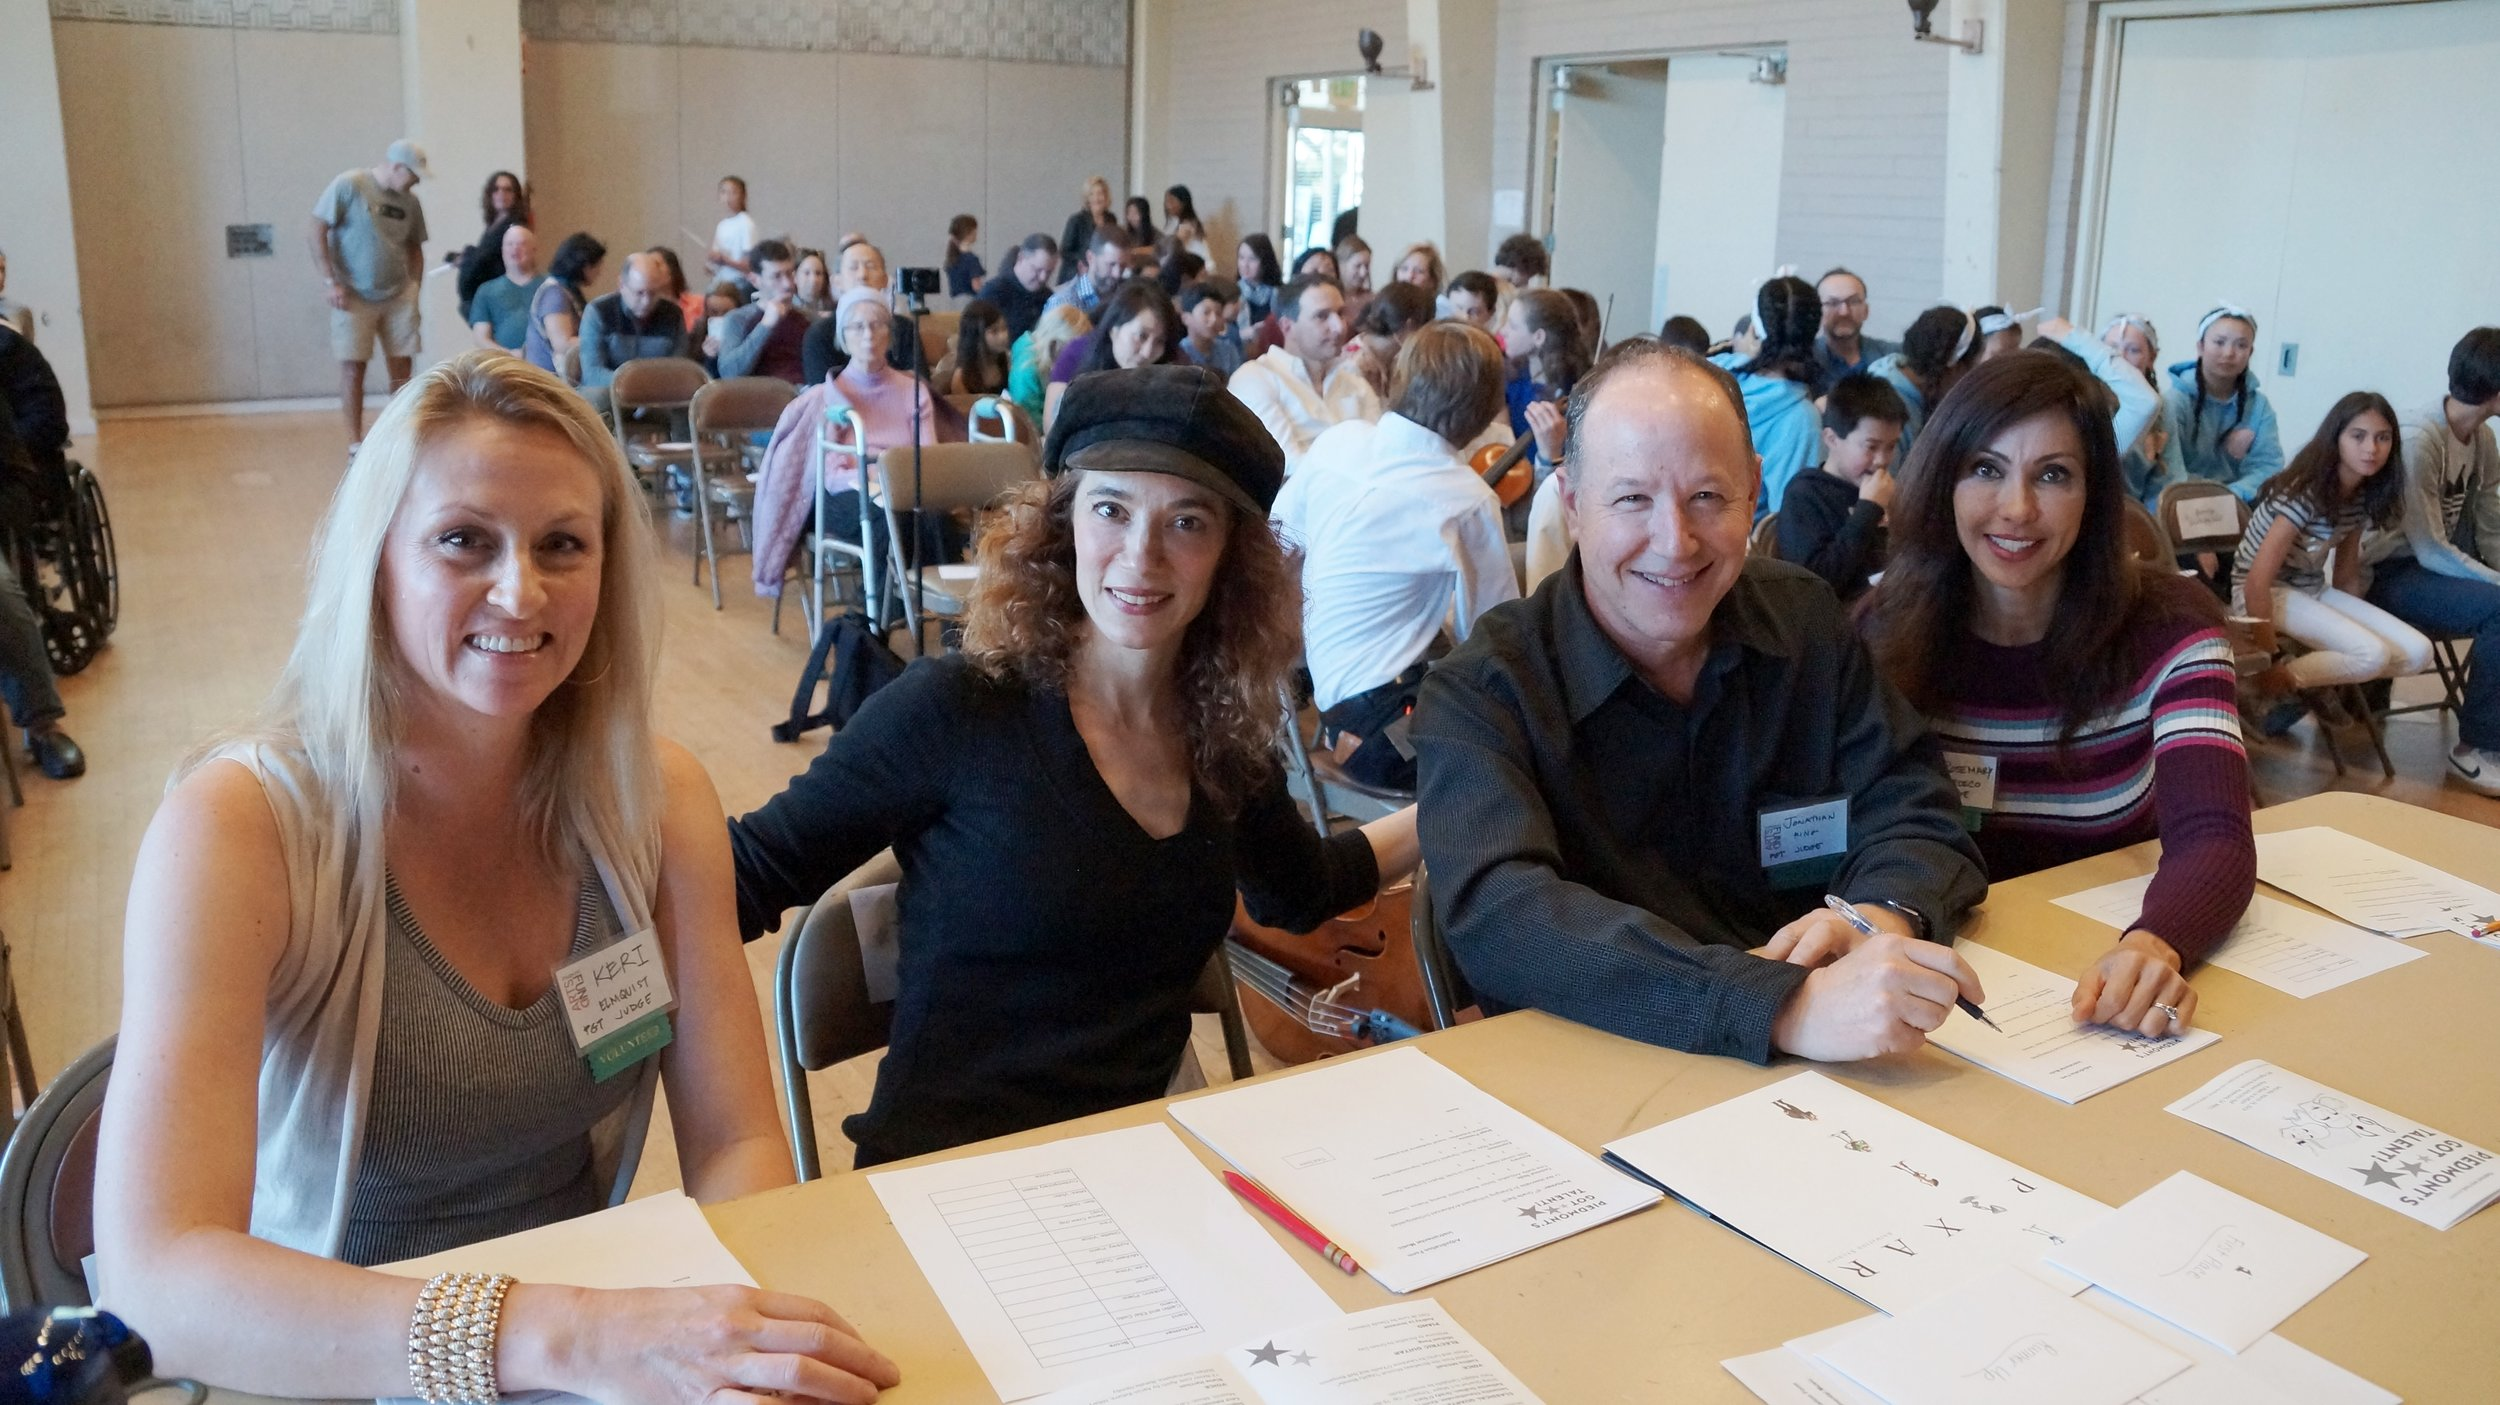 Judges: Keri Elmquist, Emily Keyishian, Jonathan Ring, & Rosemary Orozco